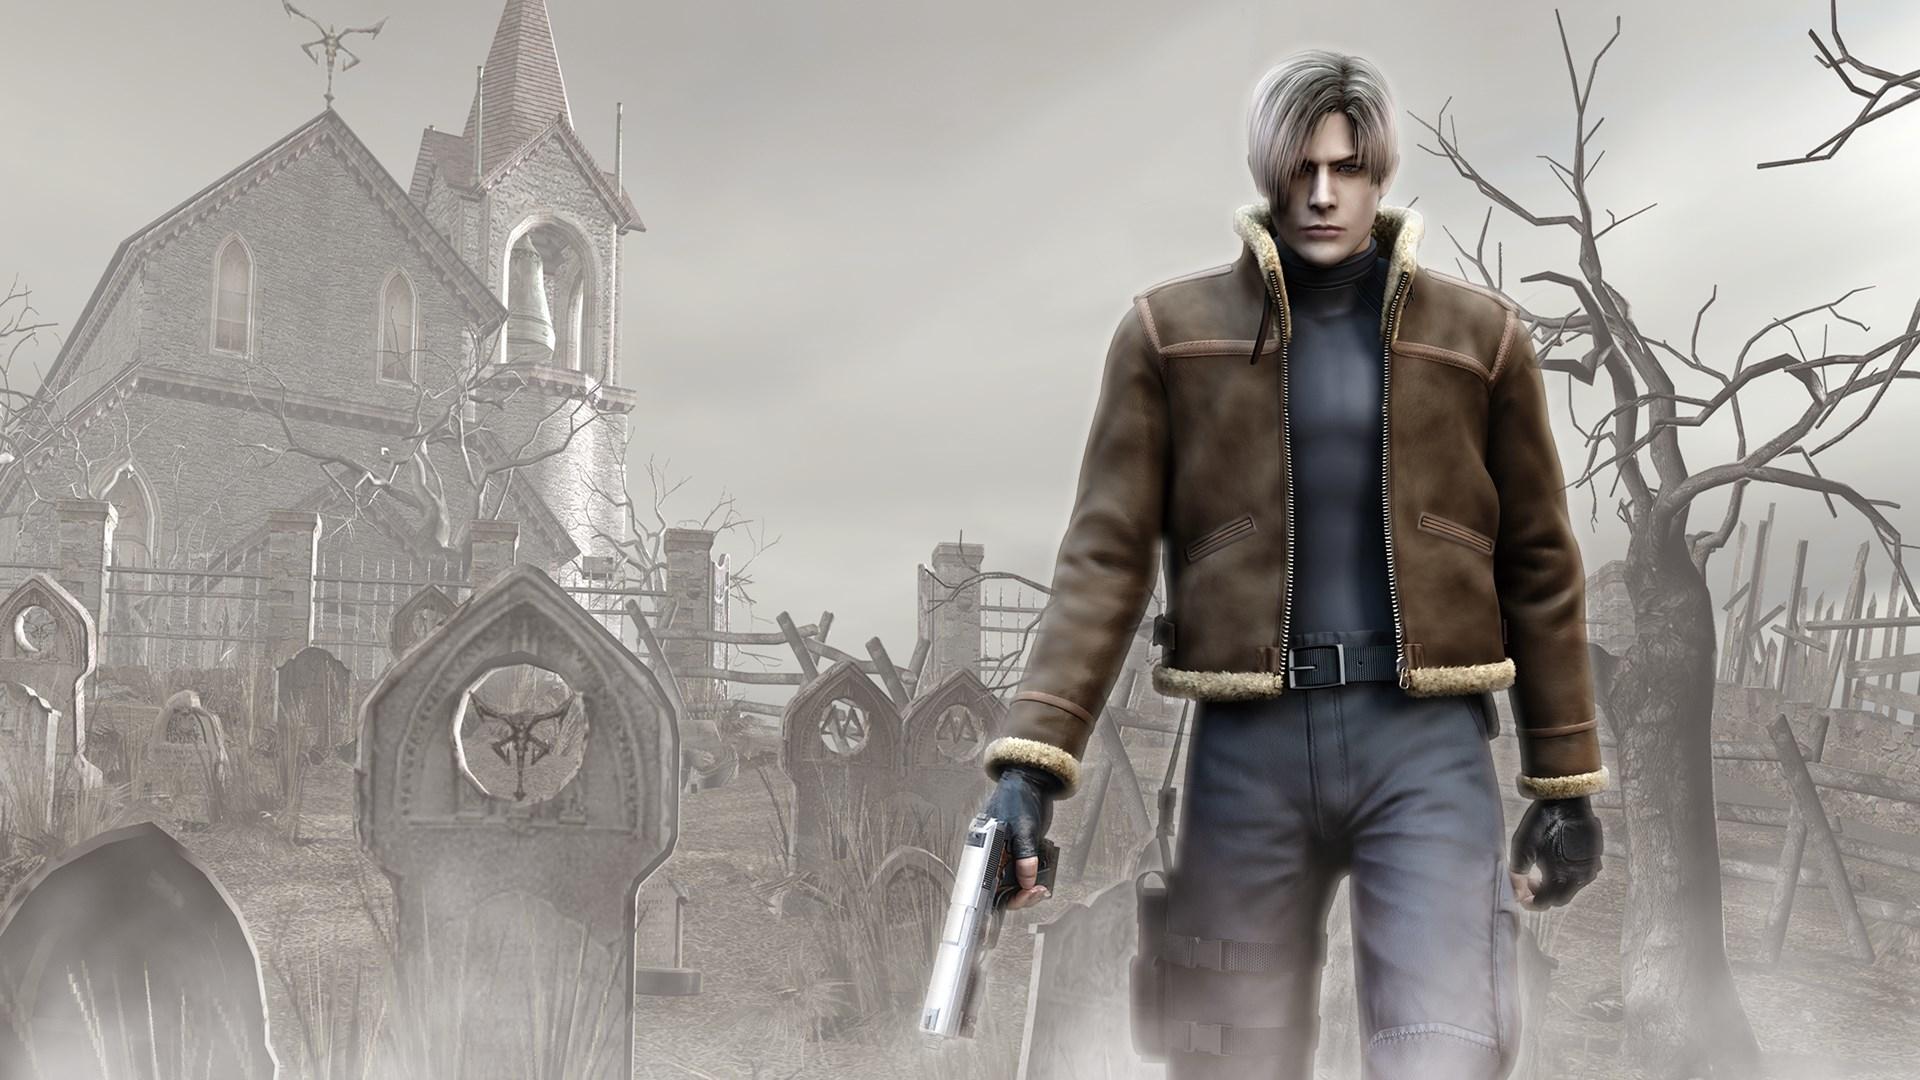 320x320 Resident Evil 4 Leon S Kennedy 320x320 Resolution